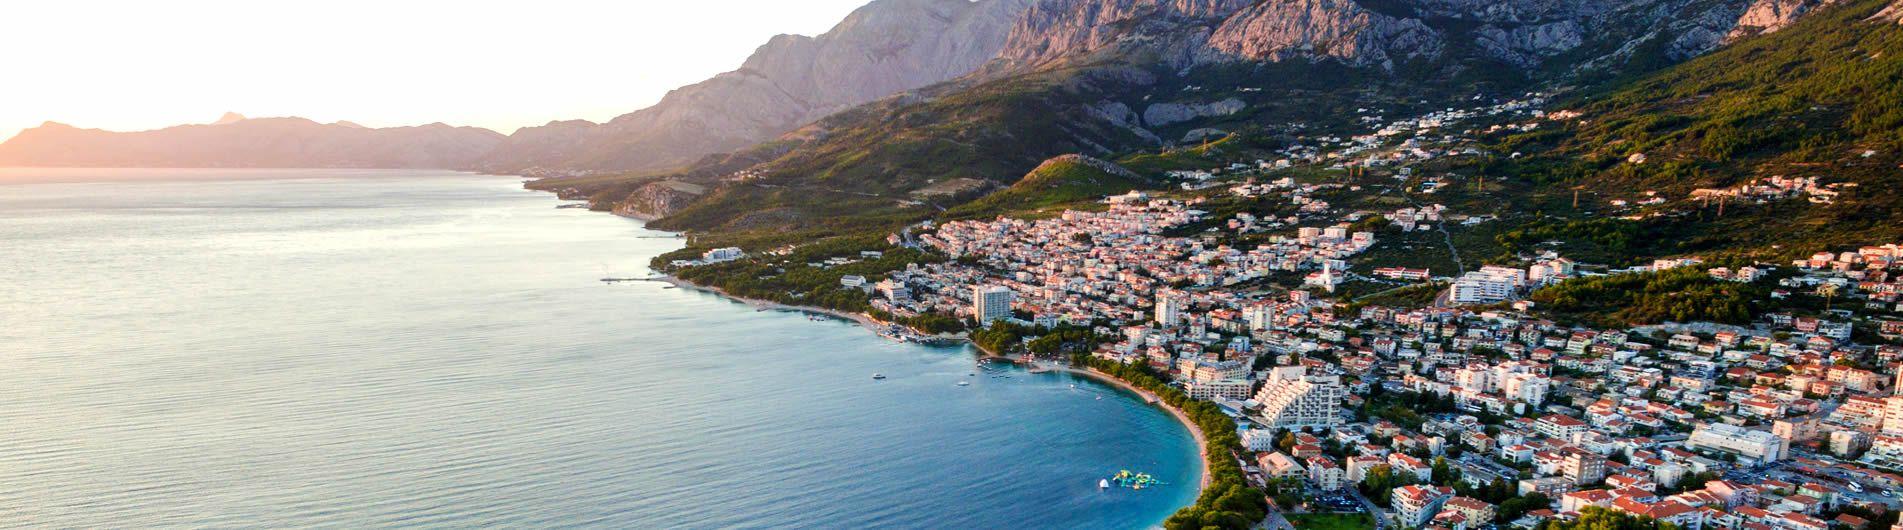 South Adriatic Coastline Tour